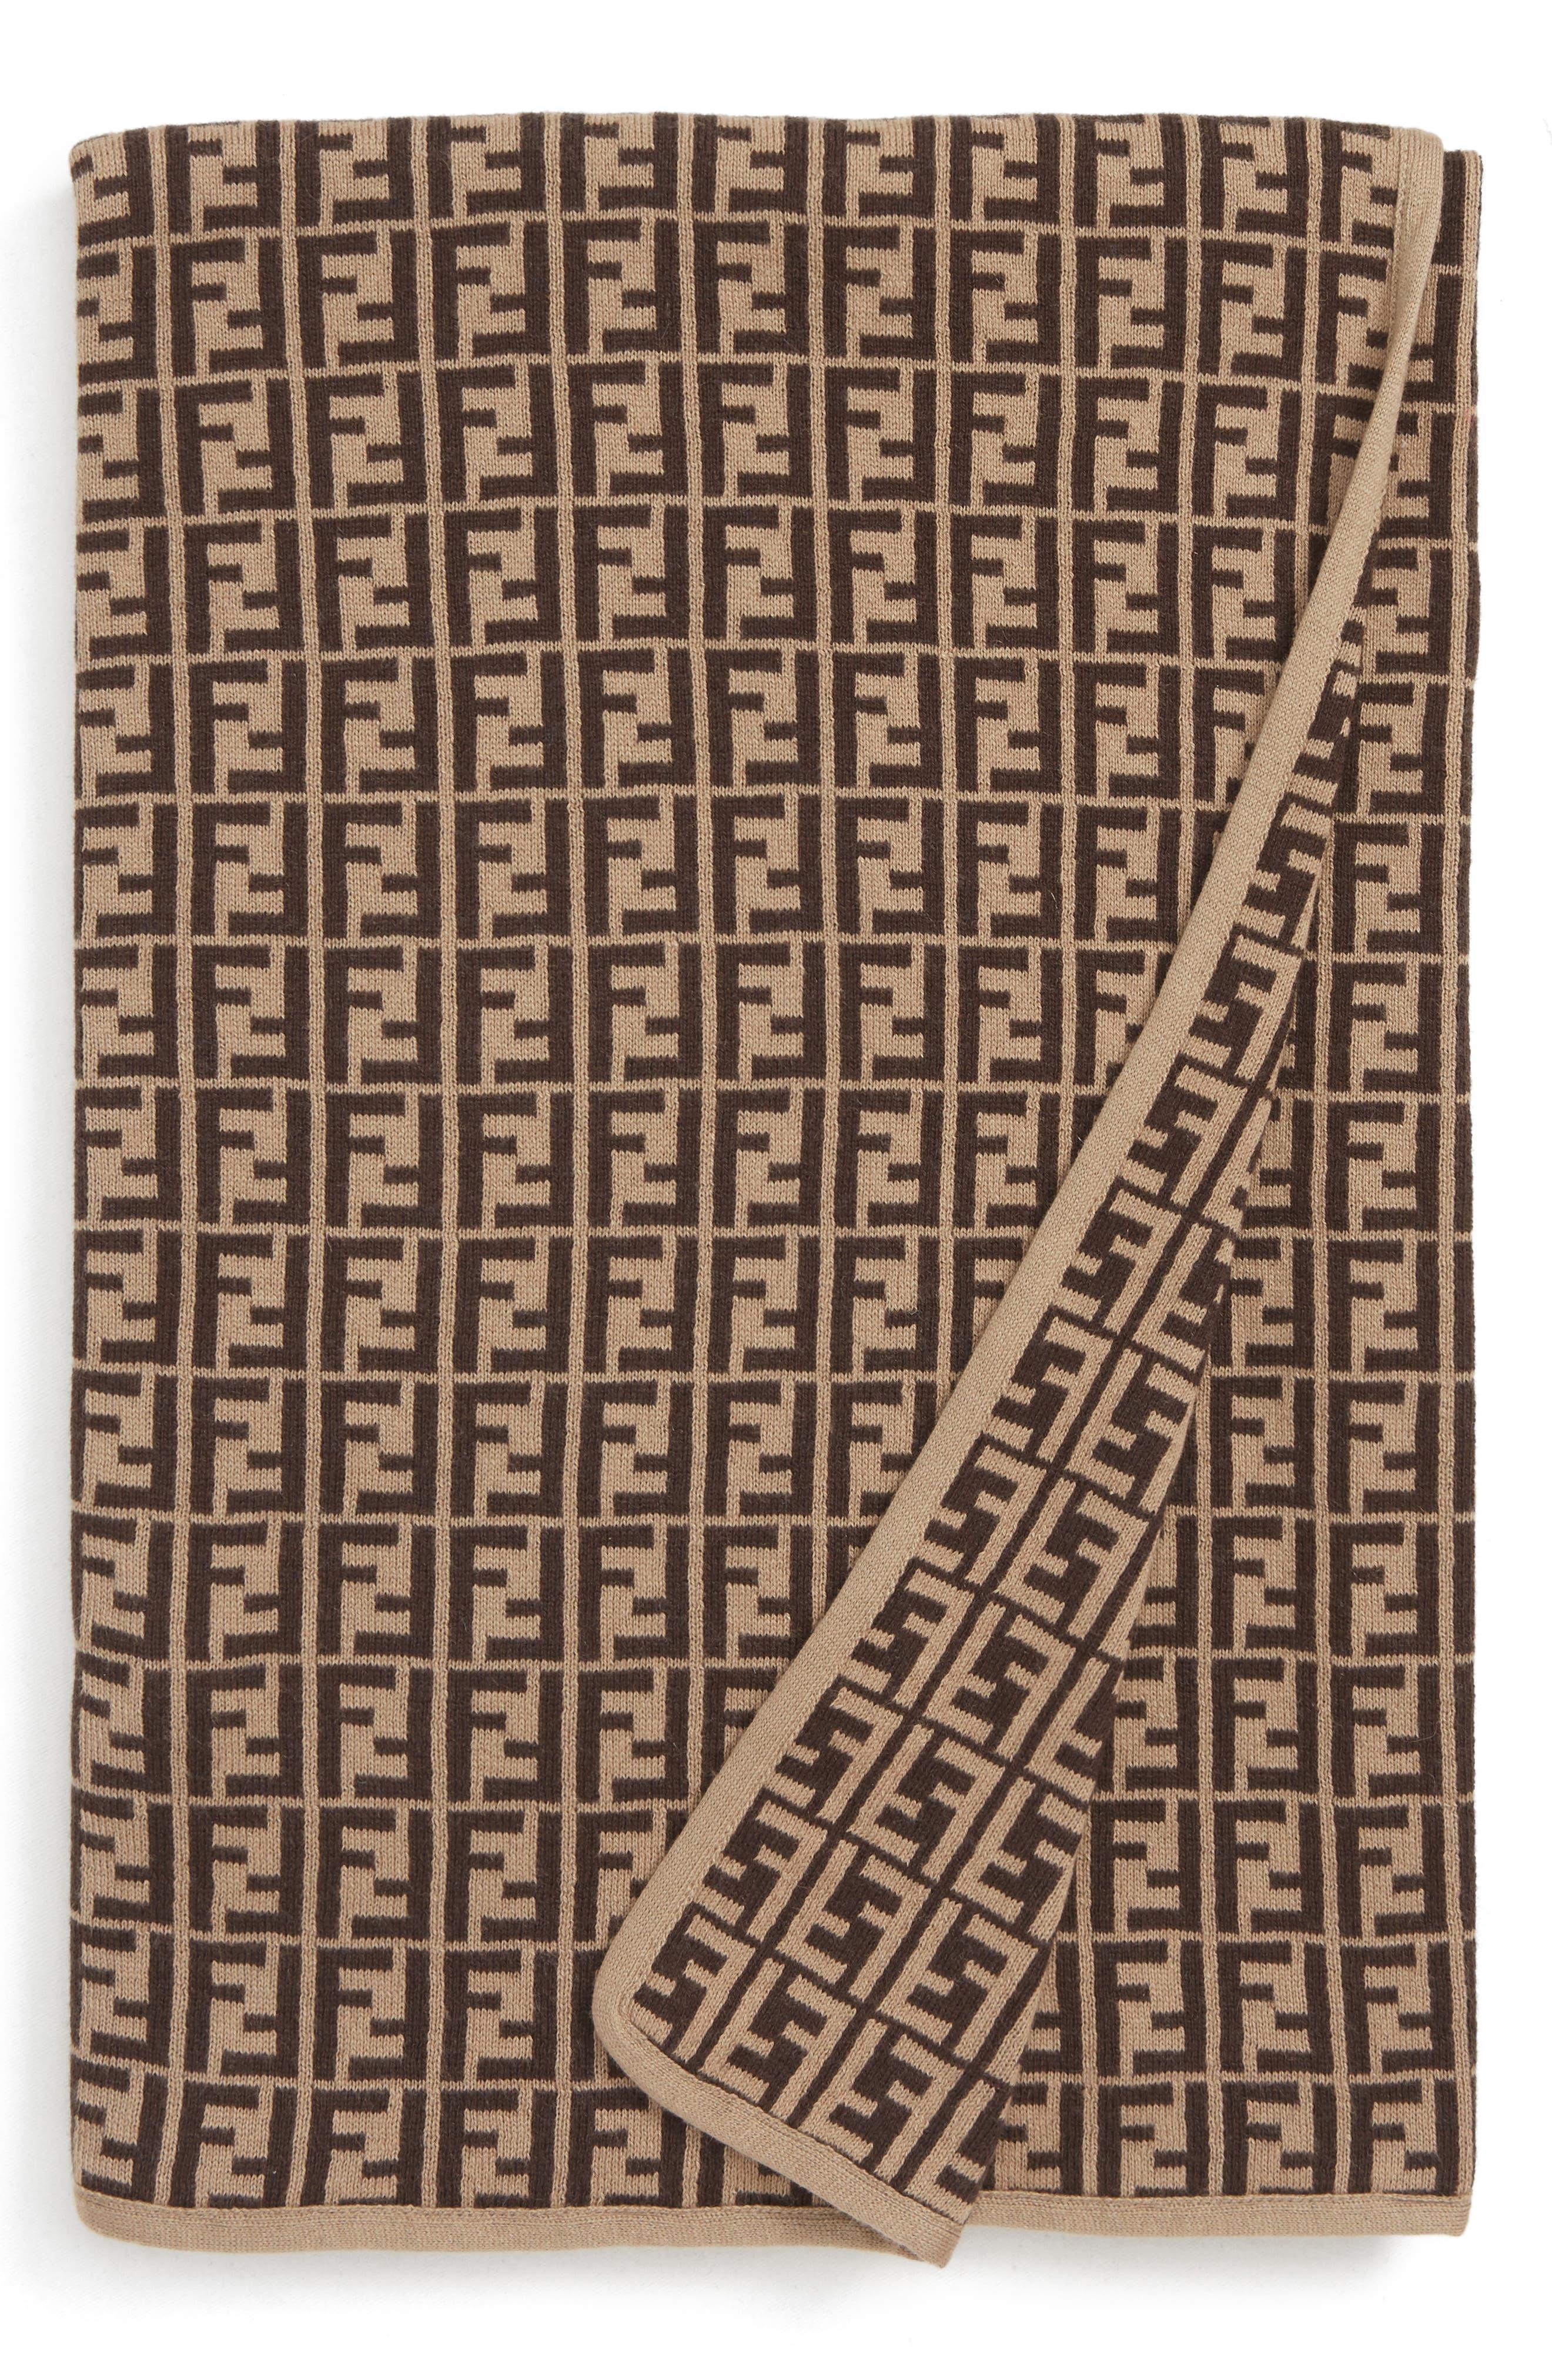 FENDI,                             Logo Cotton & Cashmere Baby Blanket,                             Main thumbnail 1, color,                             BUJ101 A3TE